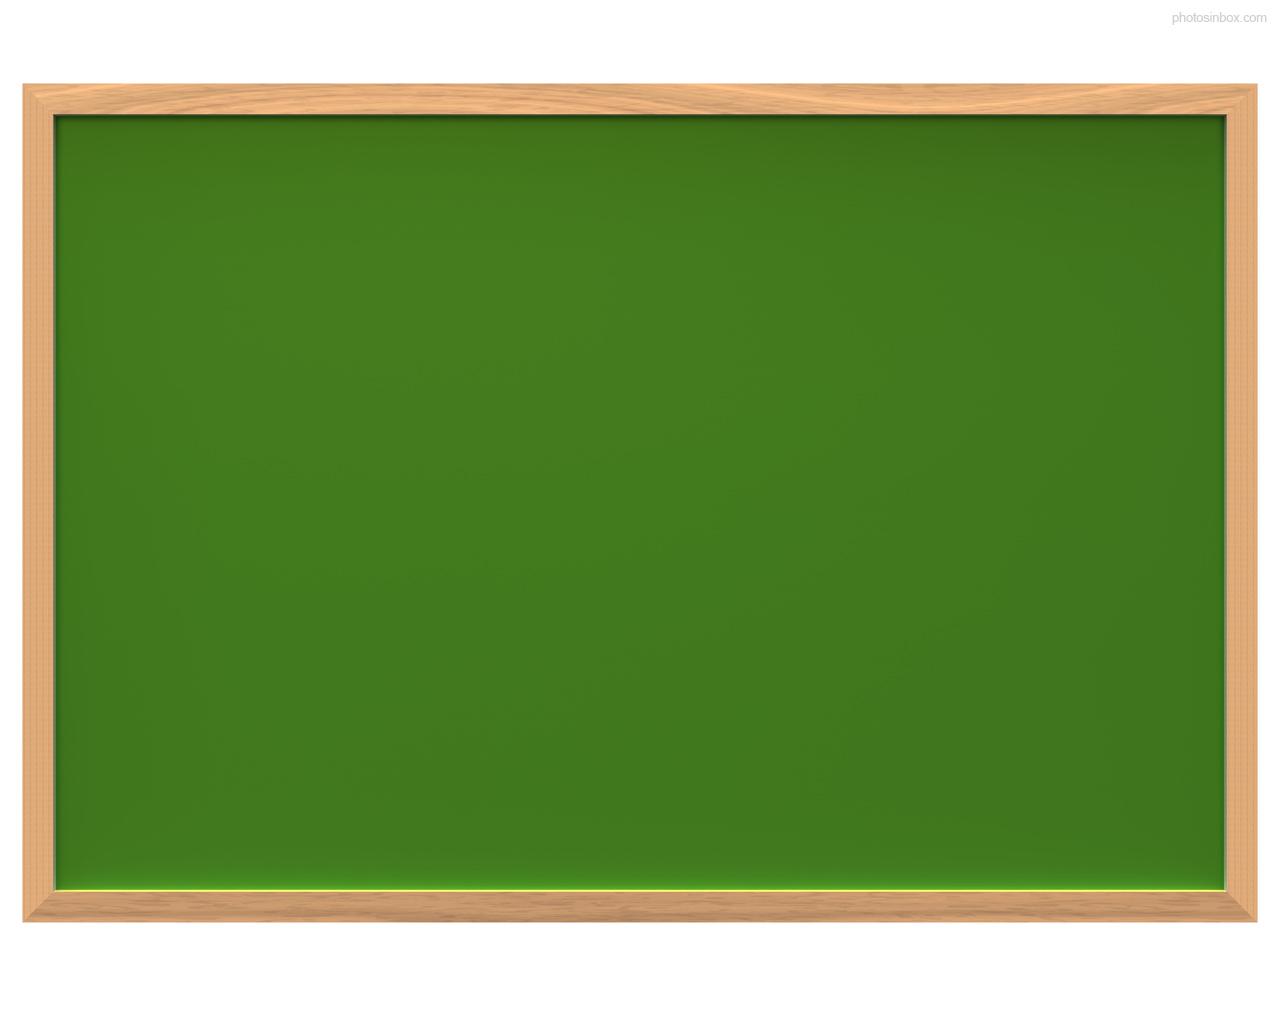 blackboard clipart display board